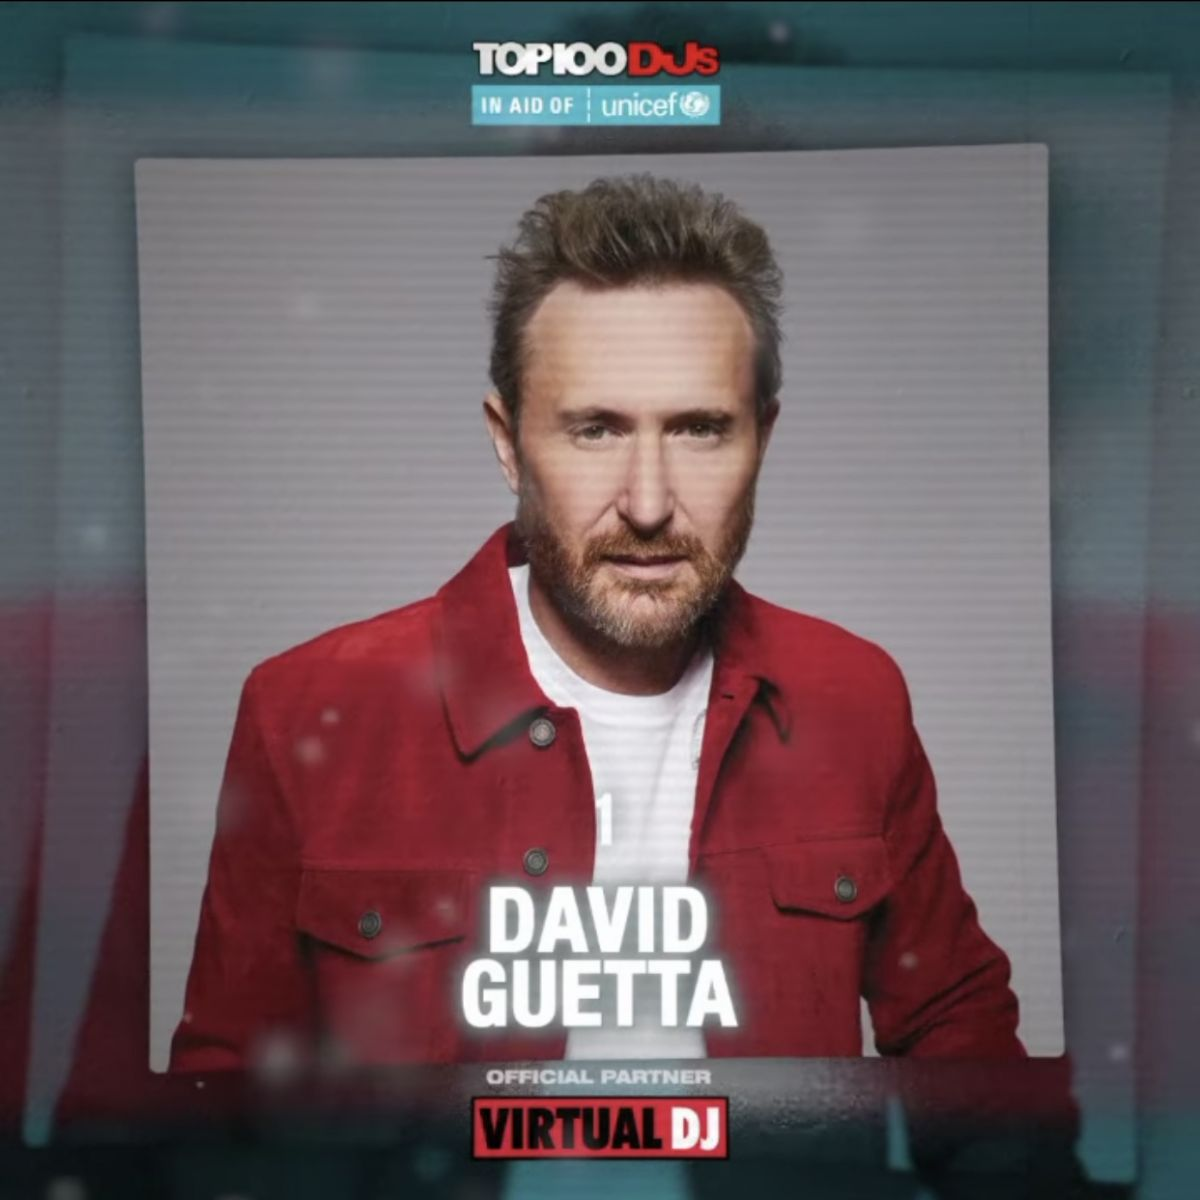 David Guetta 1 Rezultati Dj Mag Top 100 Djs 2020 07 11 2020 Kiss Fm Ukraine